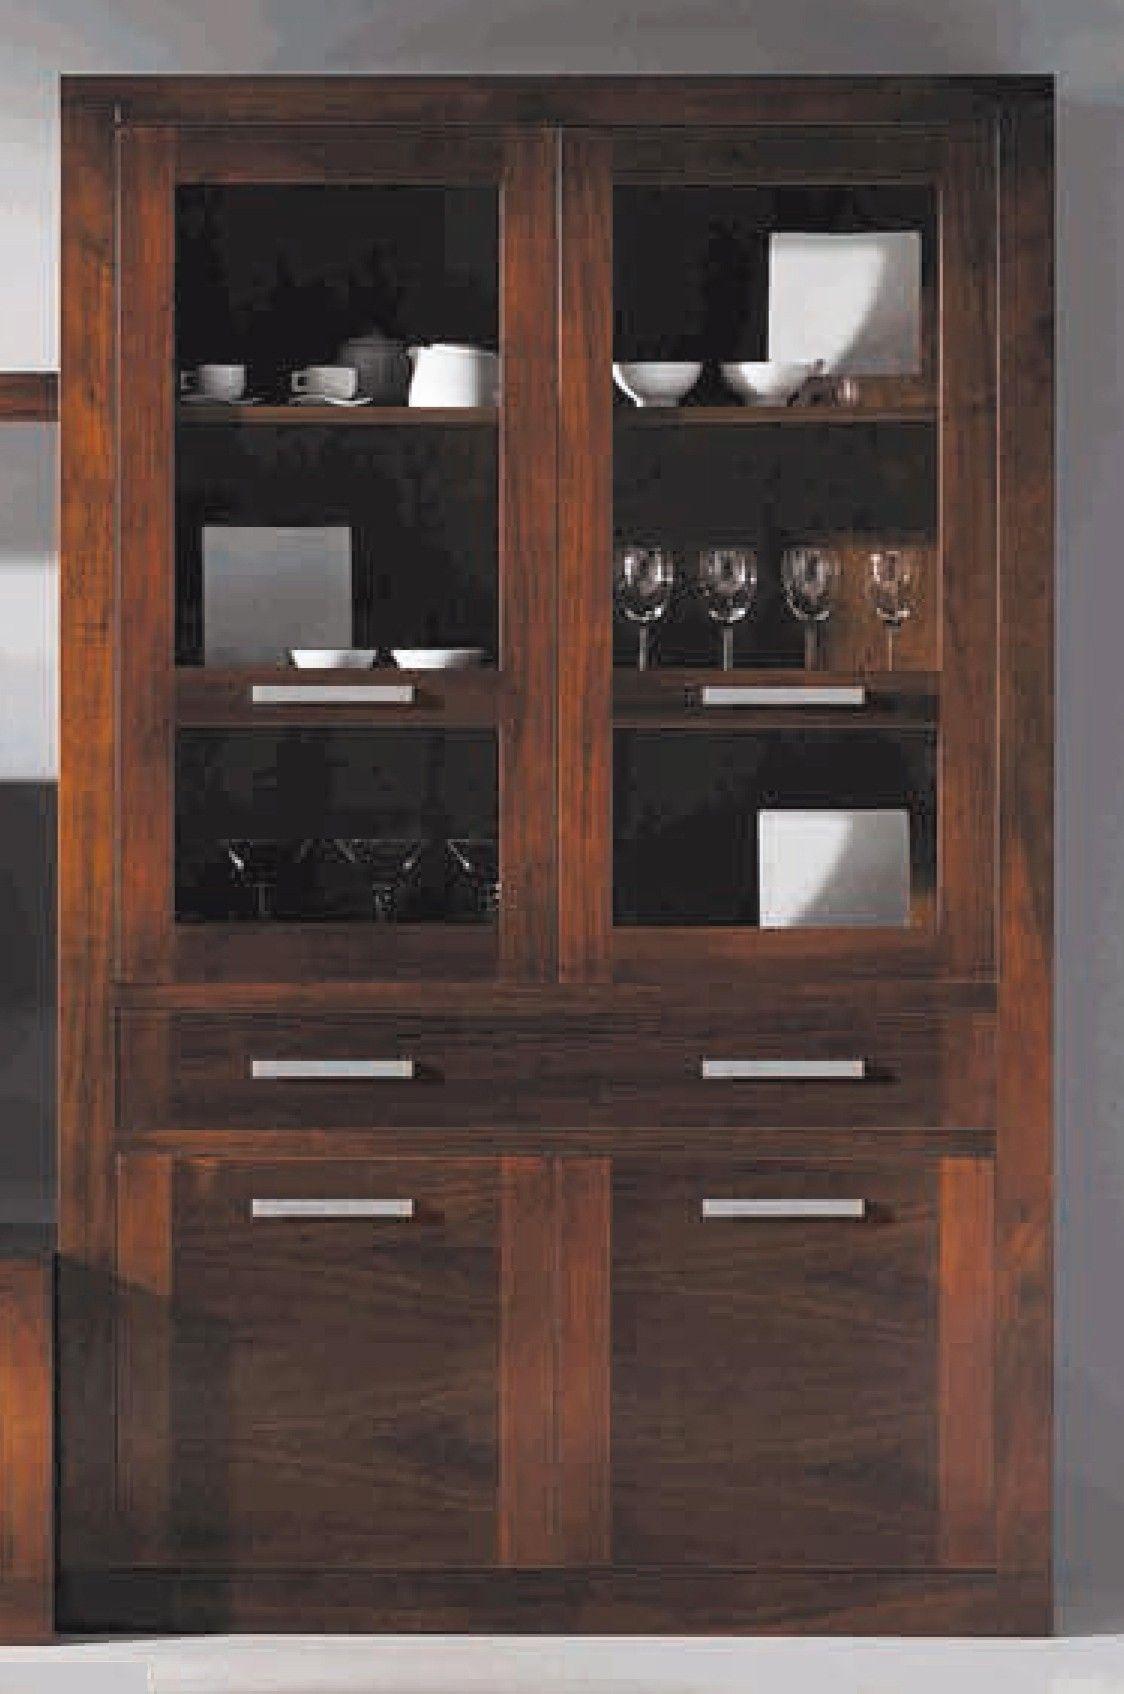 Vitrina Puertas Cristal Madera Nogal R1002_3_1 Jpg 1124 1694  # Muebles Vitrinas Para Comedor